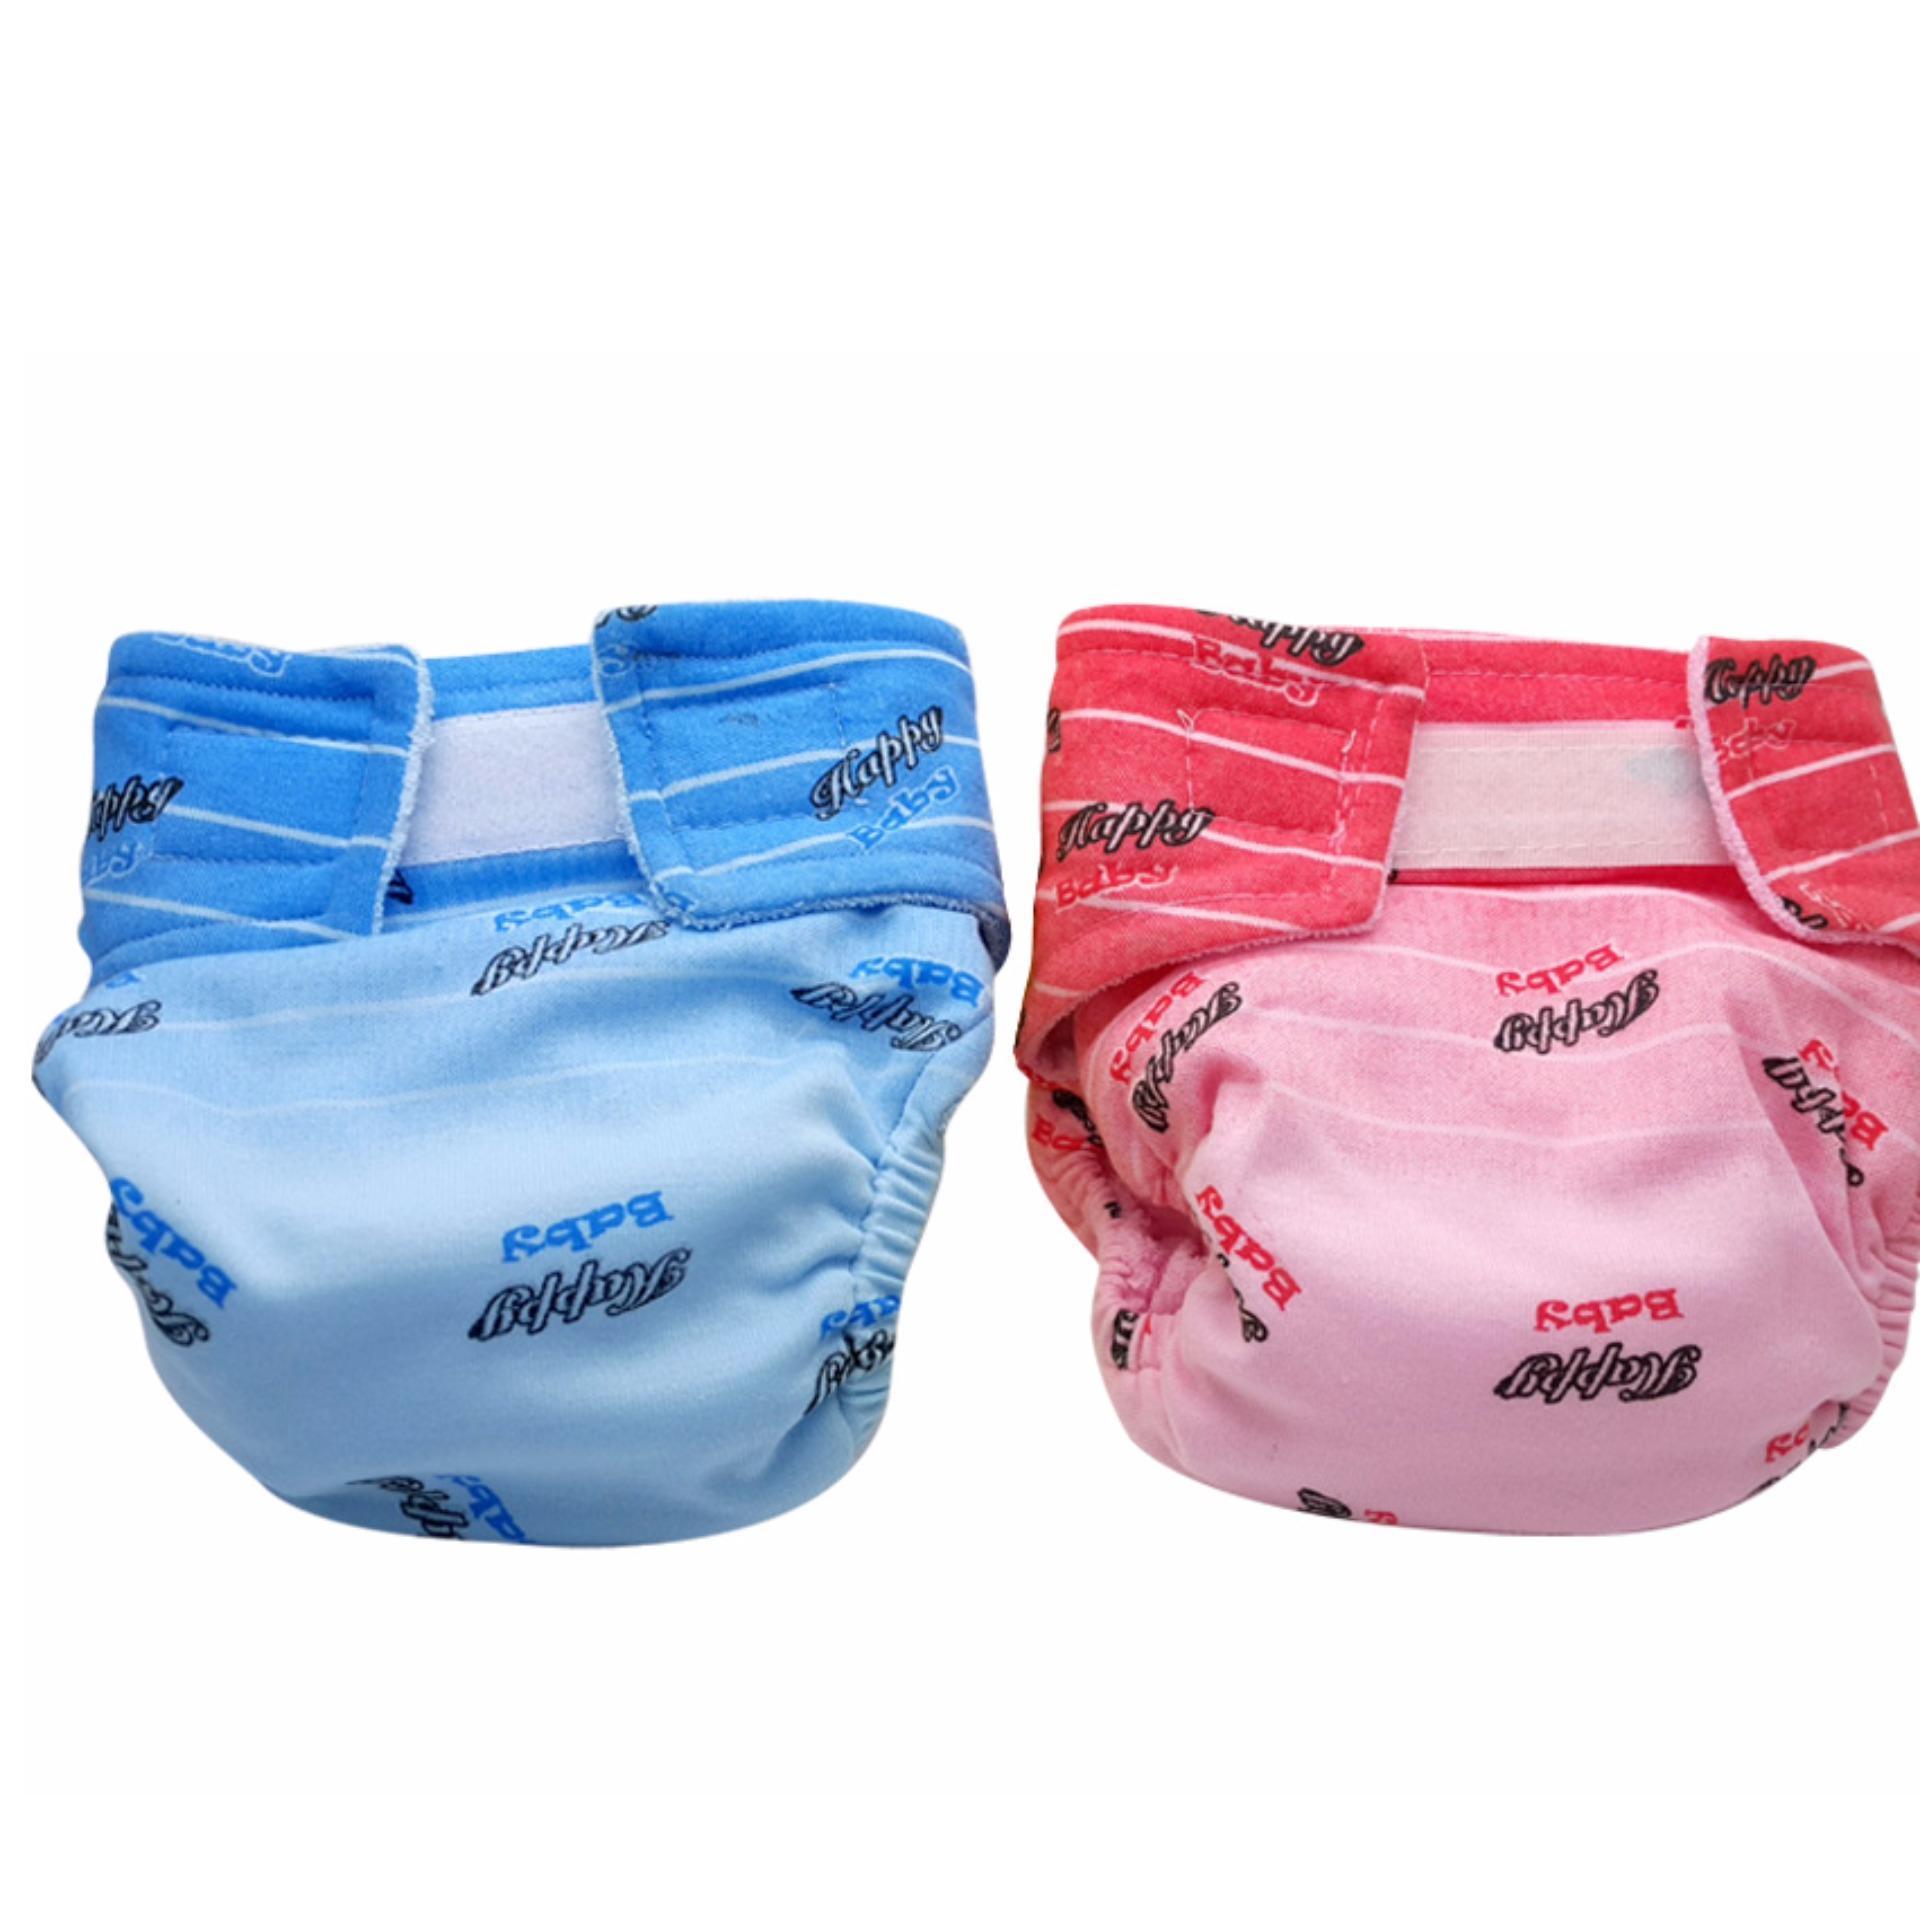 Ummi Baby Clodi model Celana Perekat Isi 2 Size L Lazada Indonesia Source .